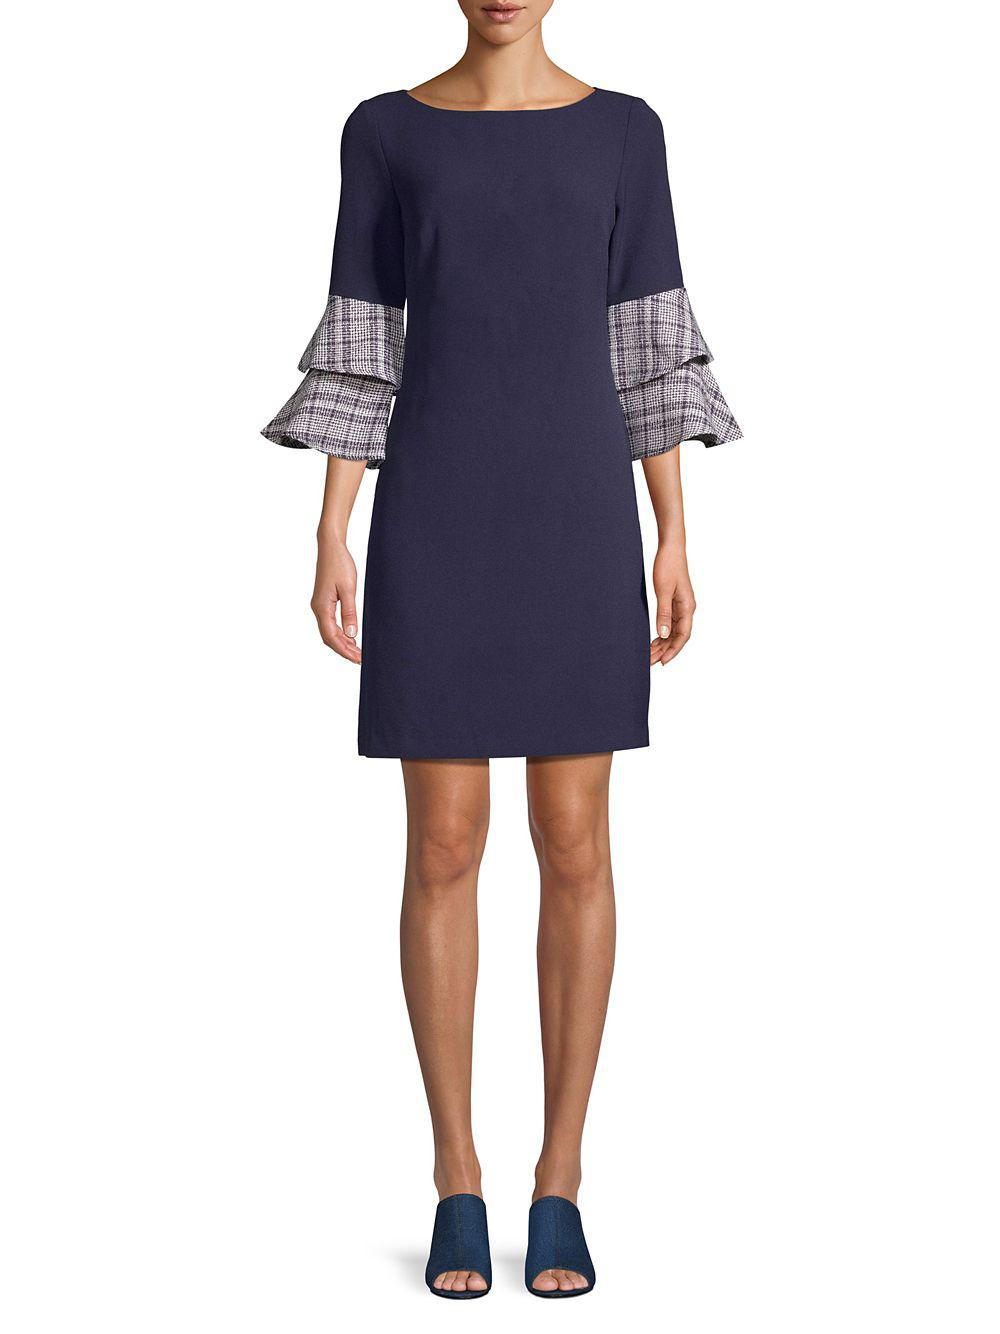 995f5b48c62f42 Eliza J Double-ruffle Sleeve Sheath Dress in Blue - Lyst